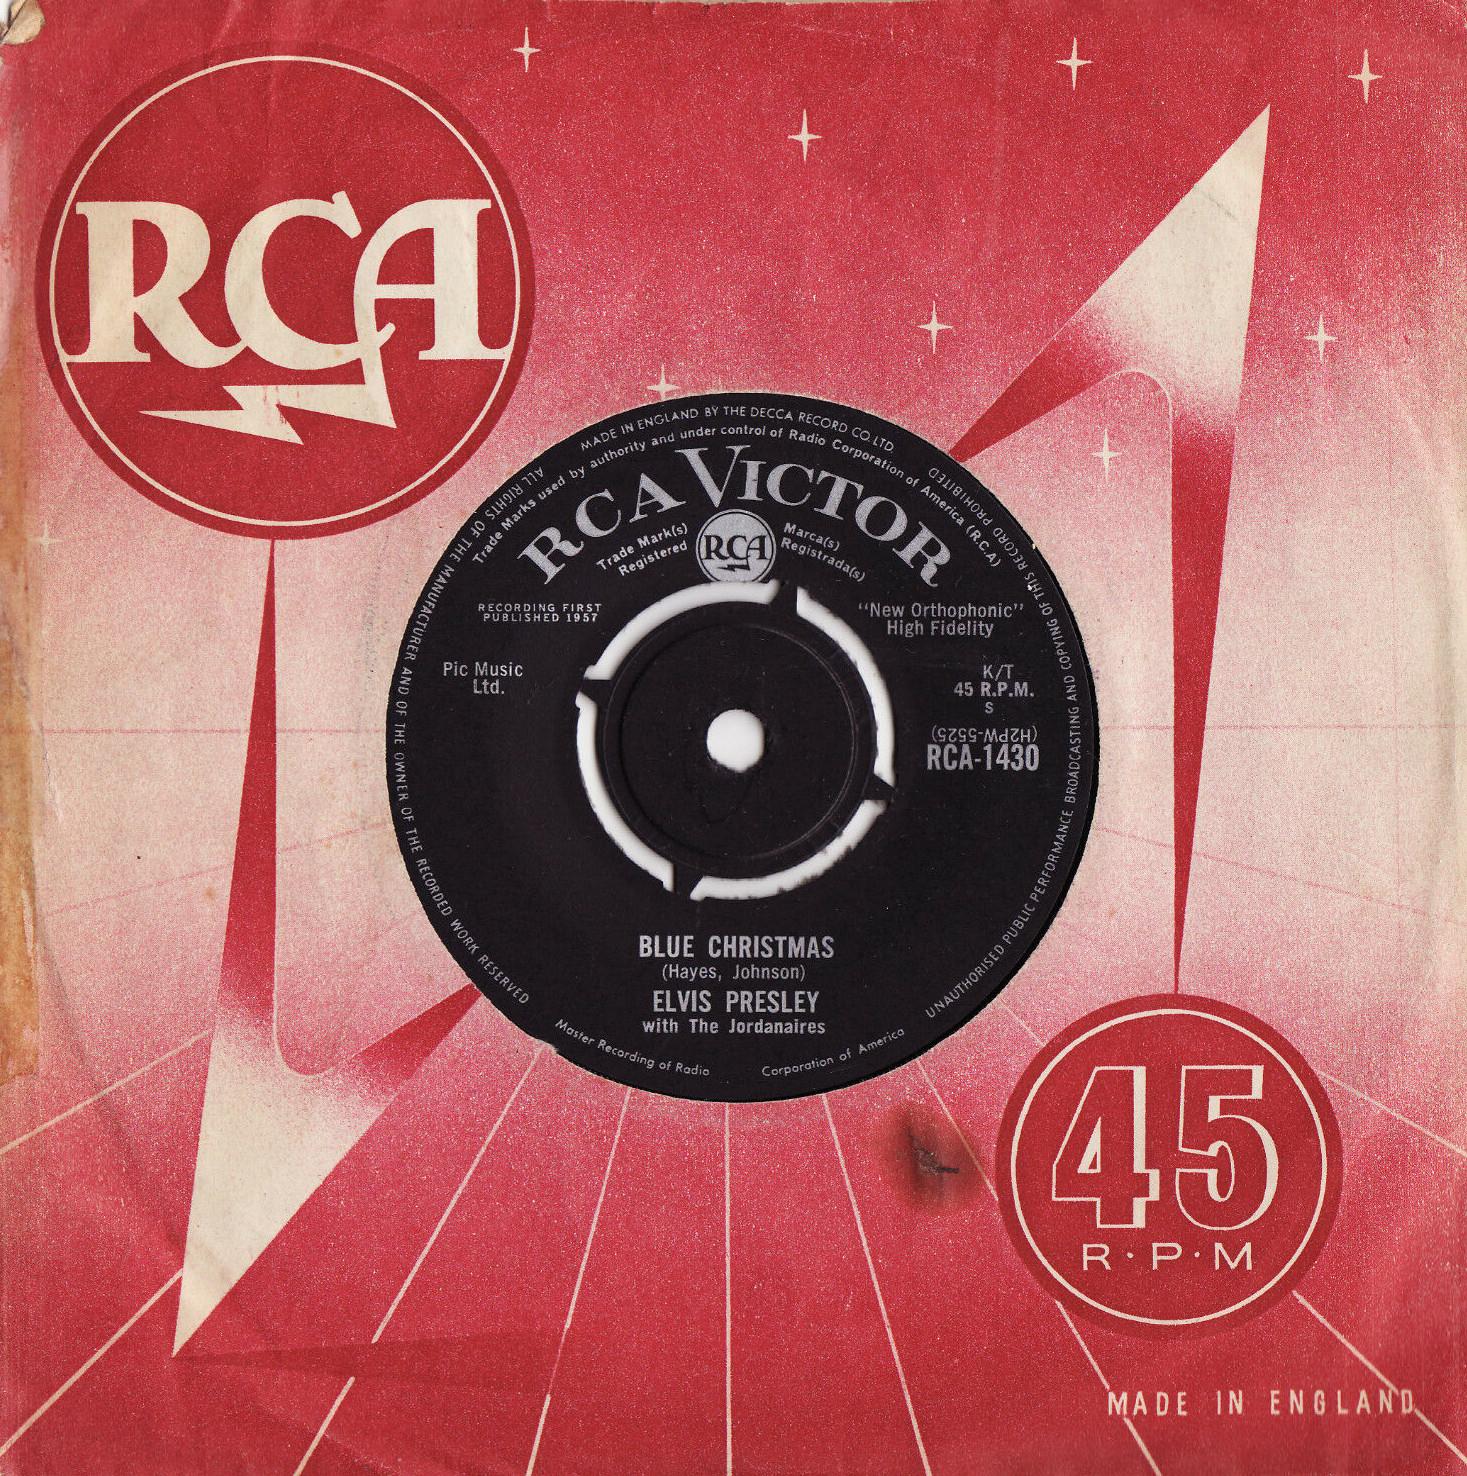 Diskografie Großbritannien (U.K.) 1956 - 1967 Rca1430clju6